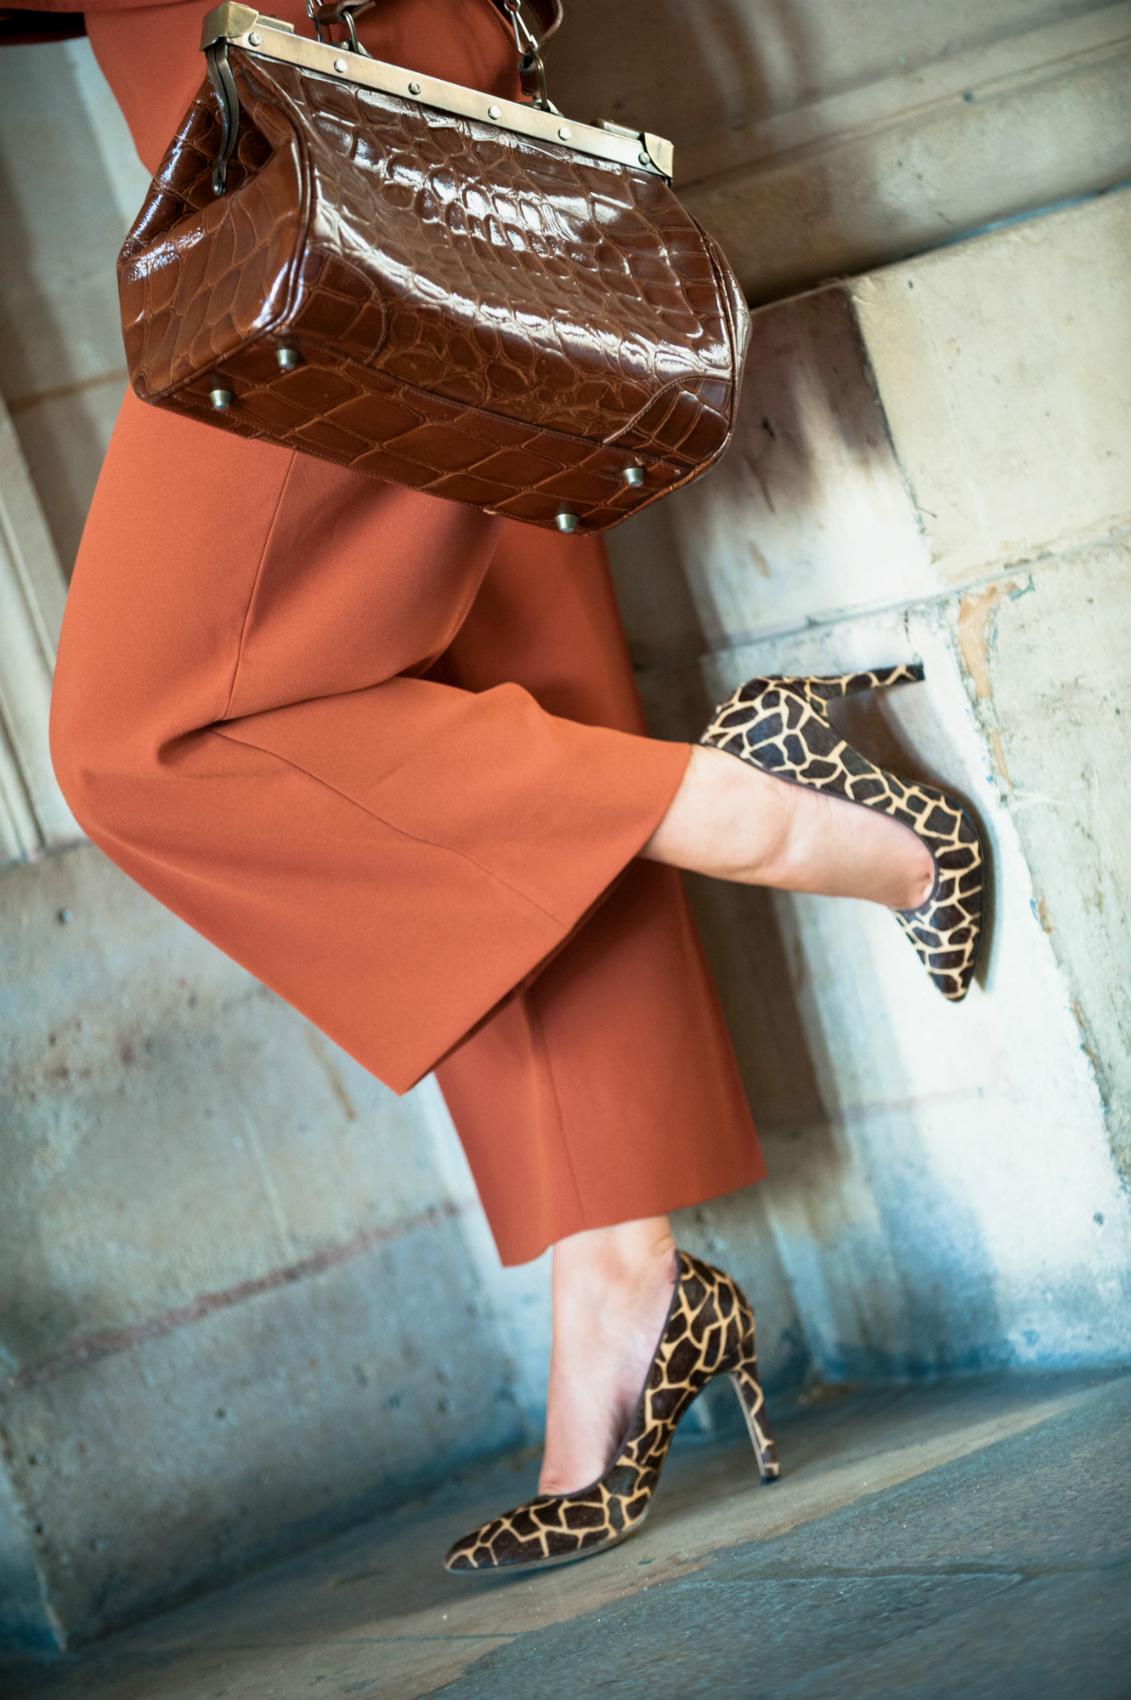 escarpins à talons imprimé animal girafe bata sac cuir croco vintage